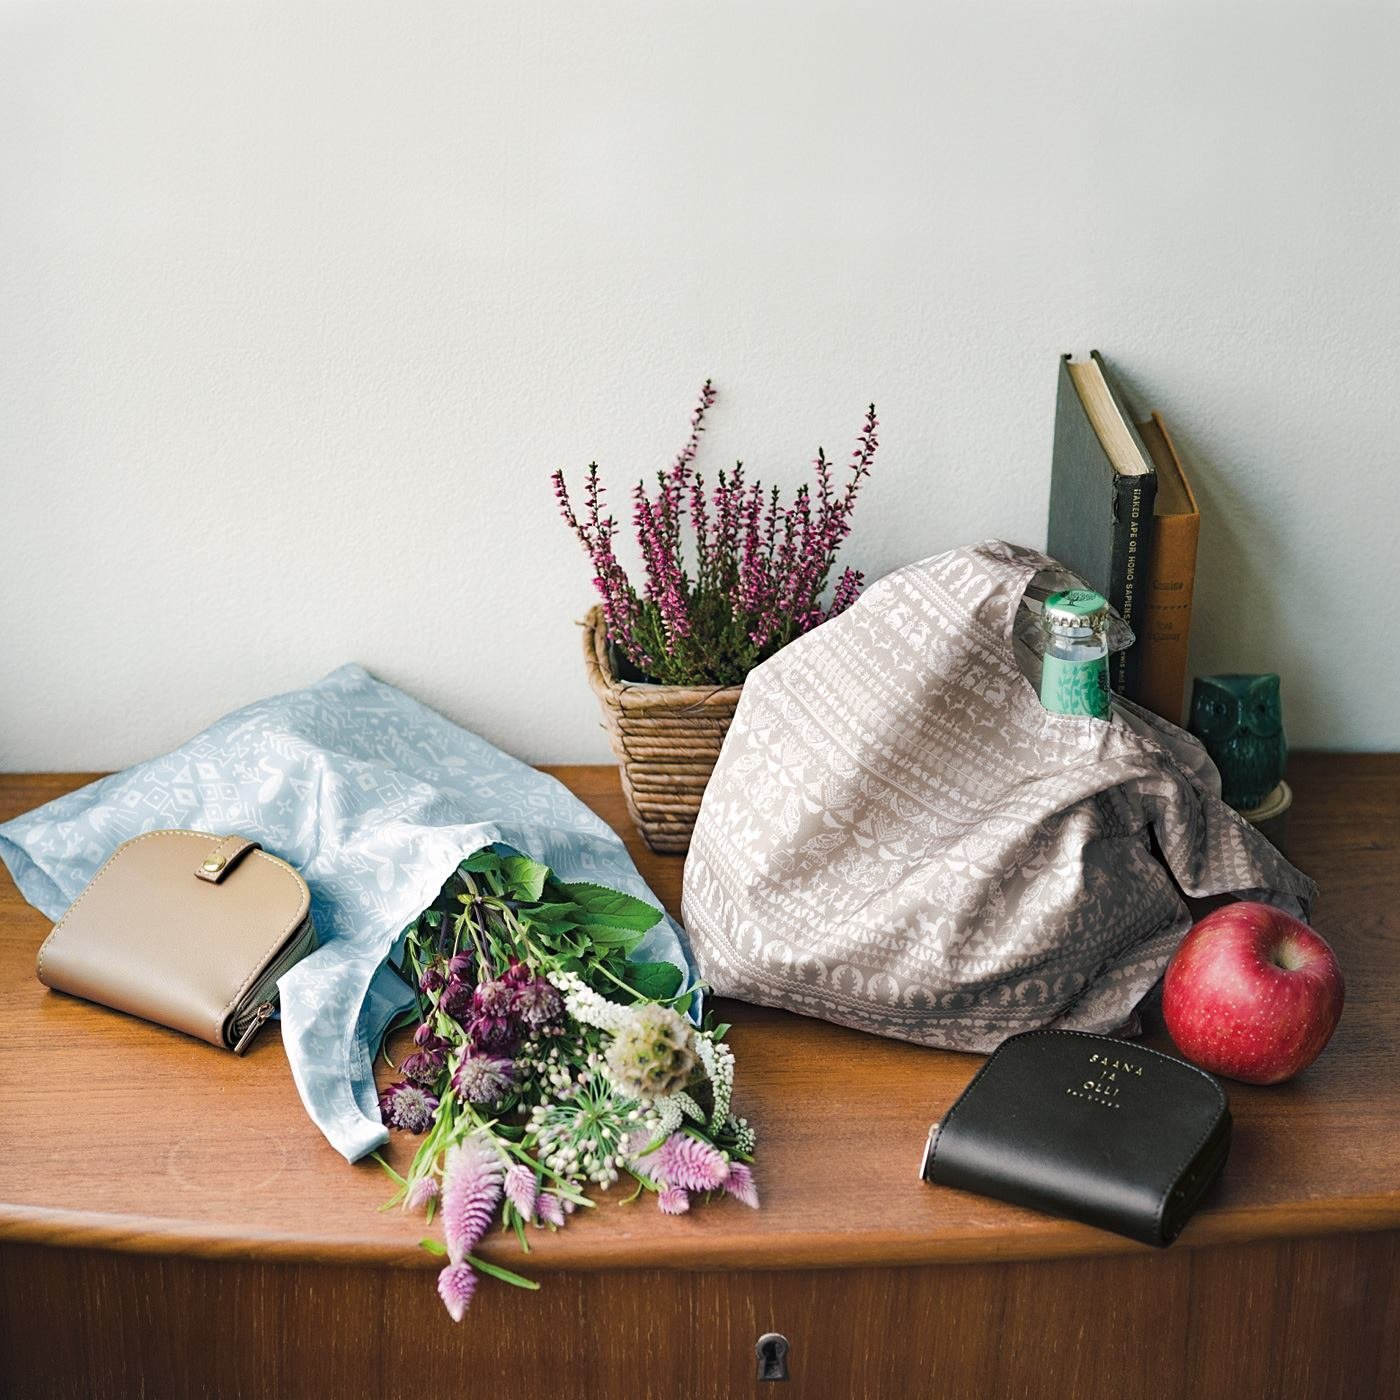 SAANA JA OLLI サーナ ヤ オッリ ミニエコバッグと収納ポケット付きの二つ折り財布の会